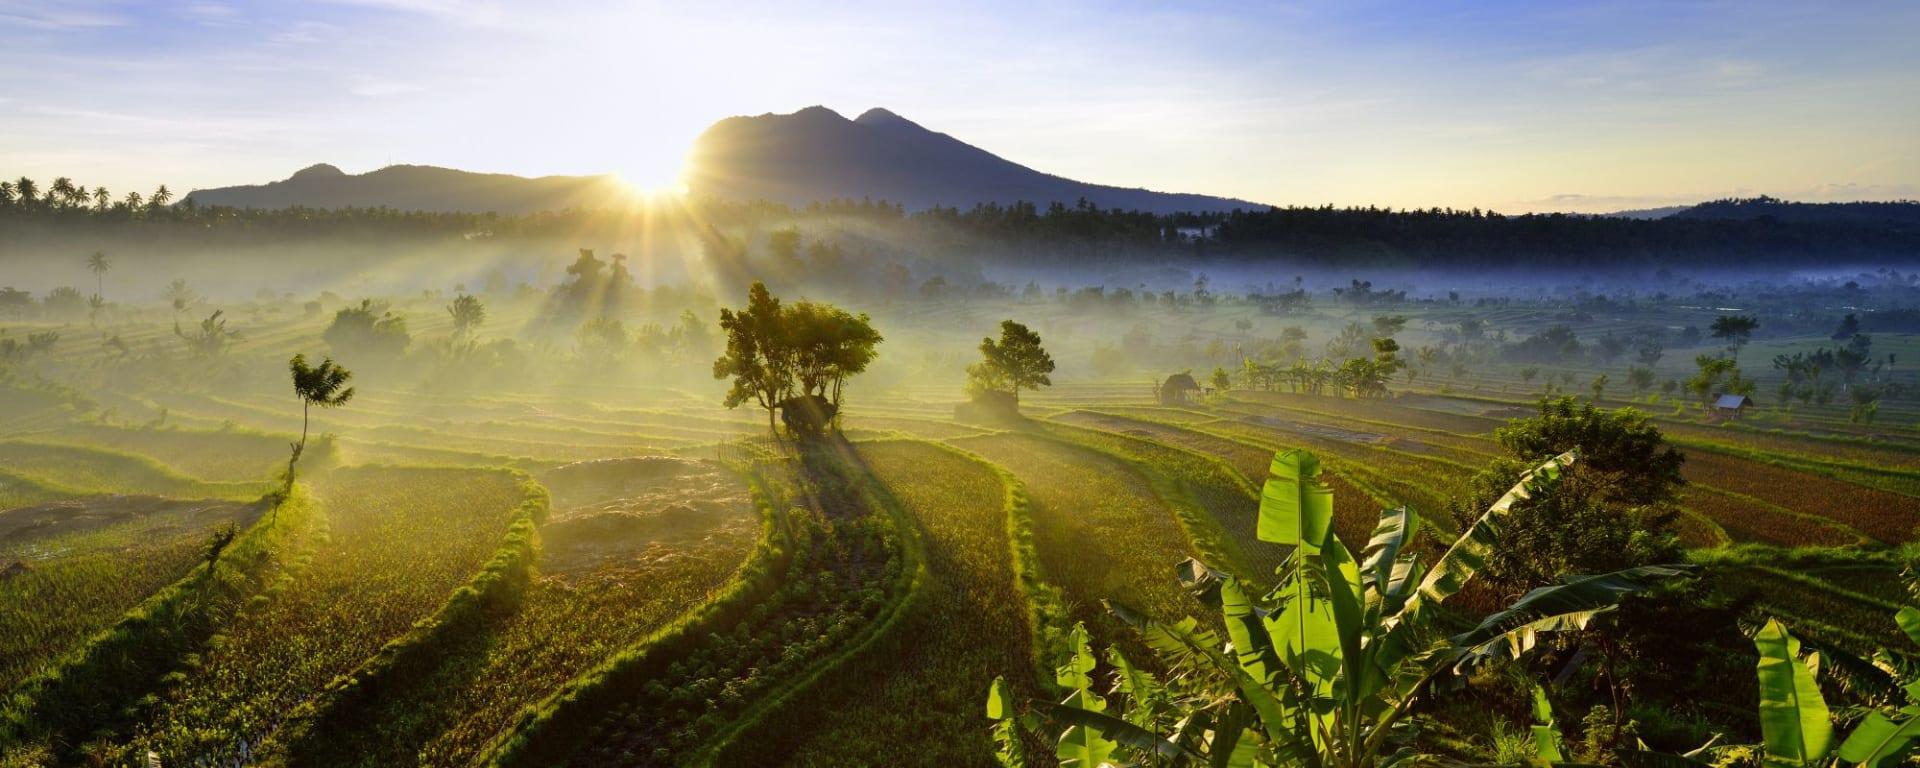 Erlebnisreiches Bali ab Südbali: Bali rice fields East Bali